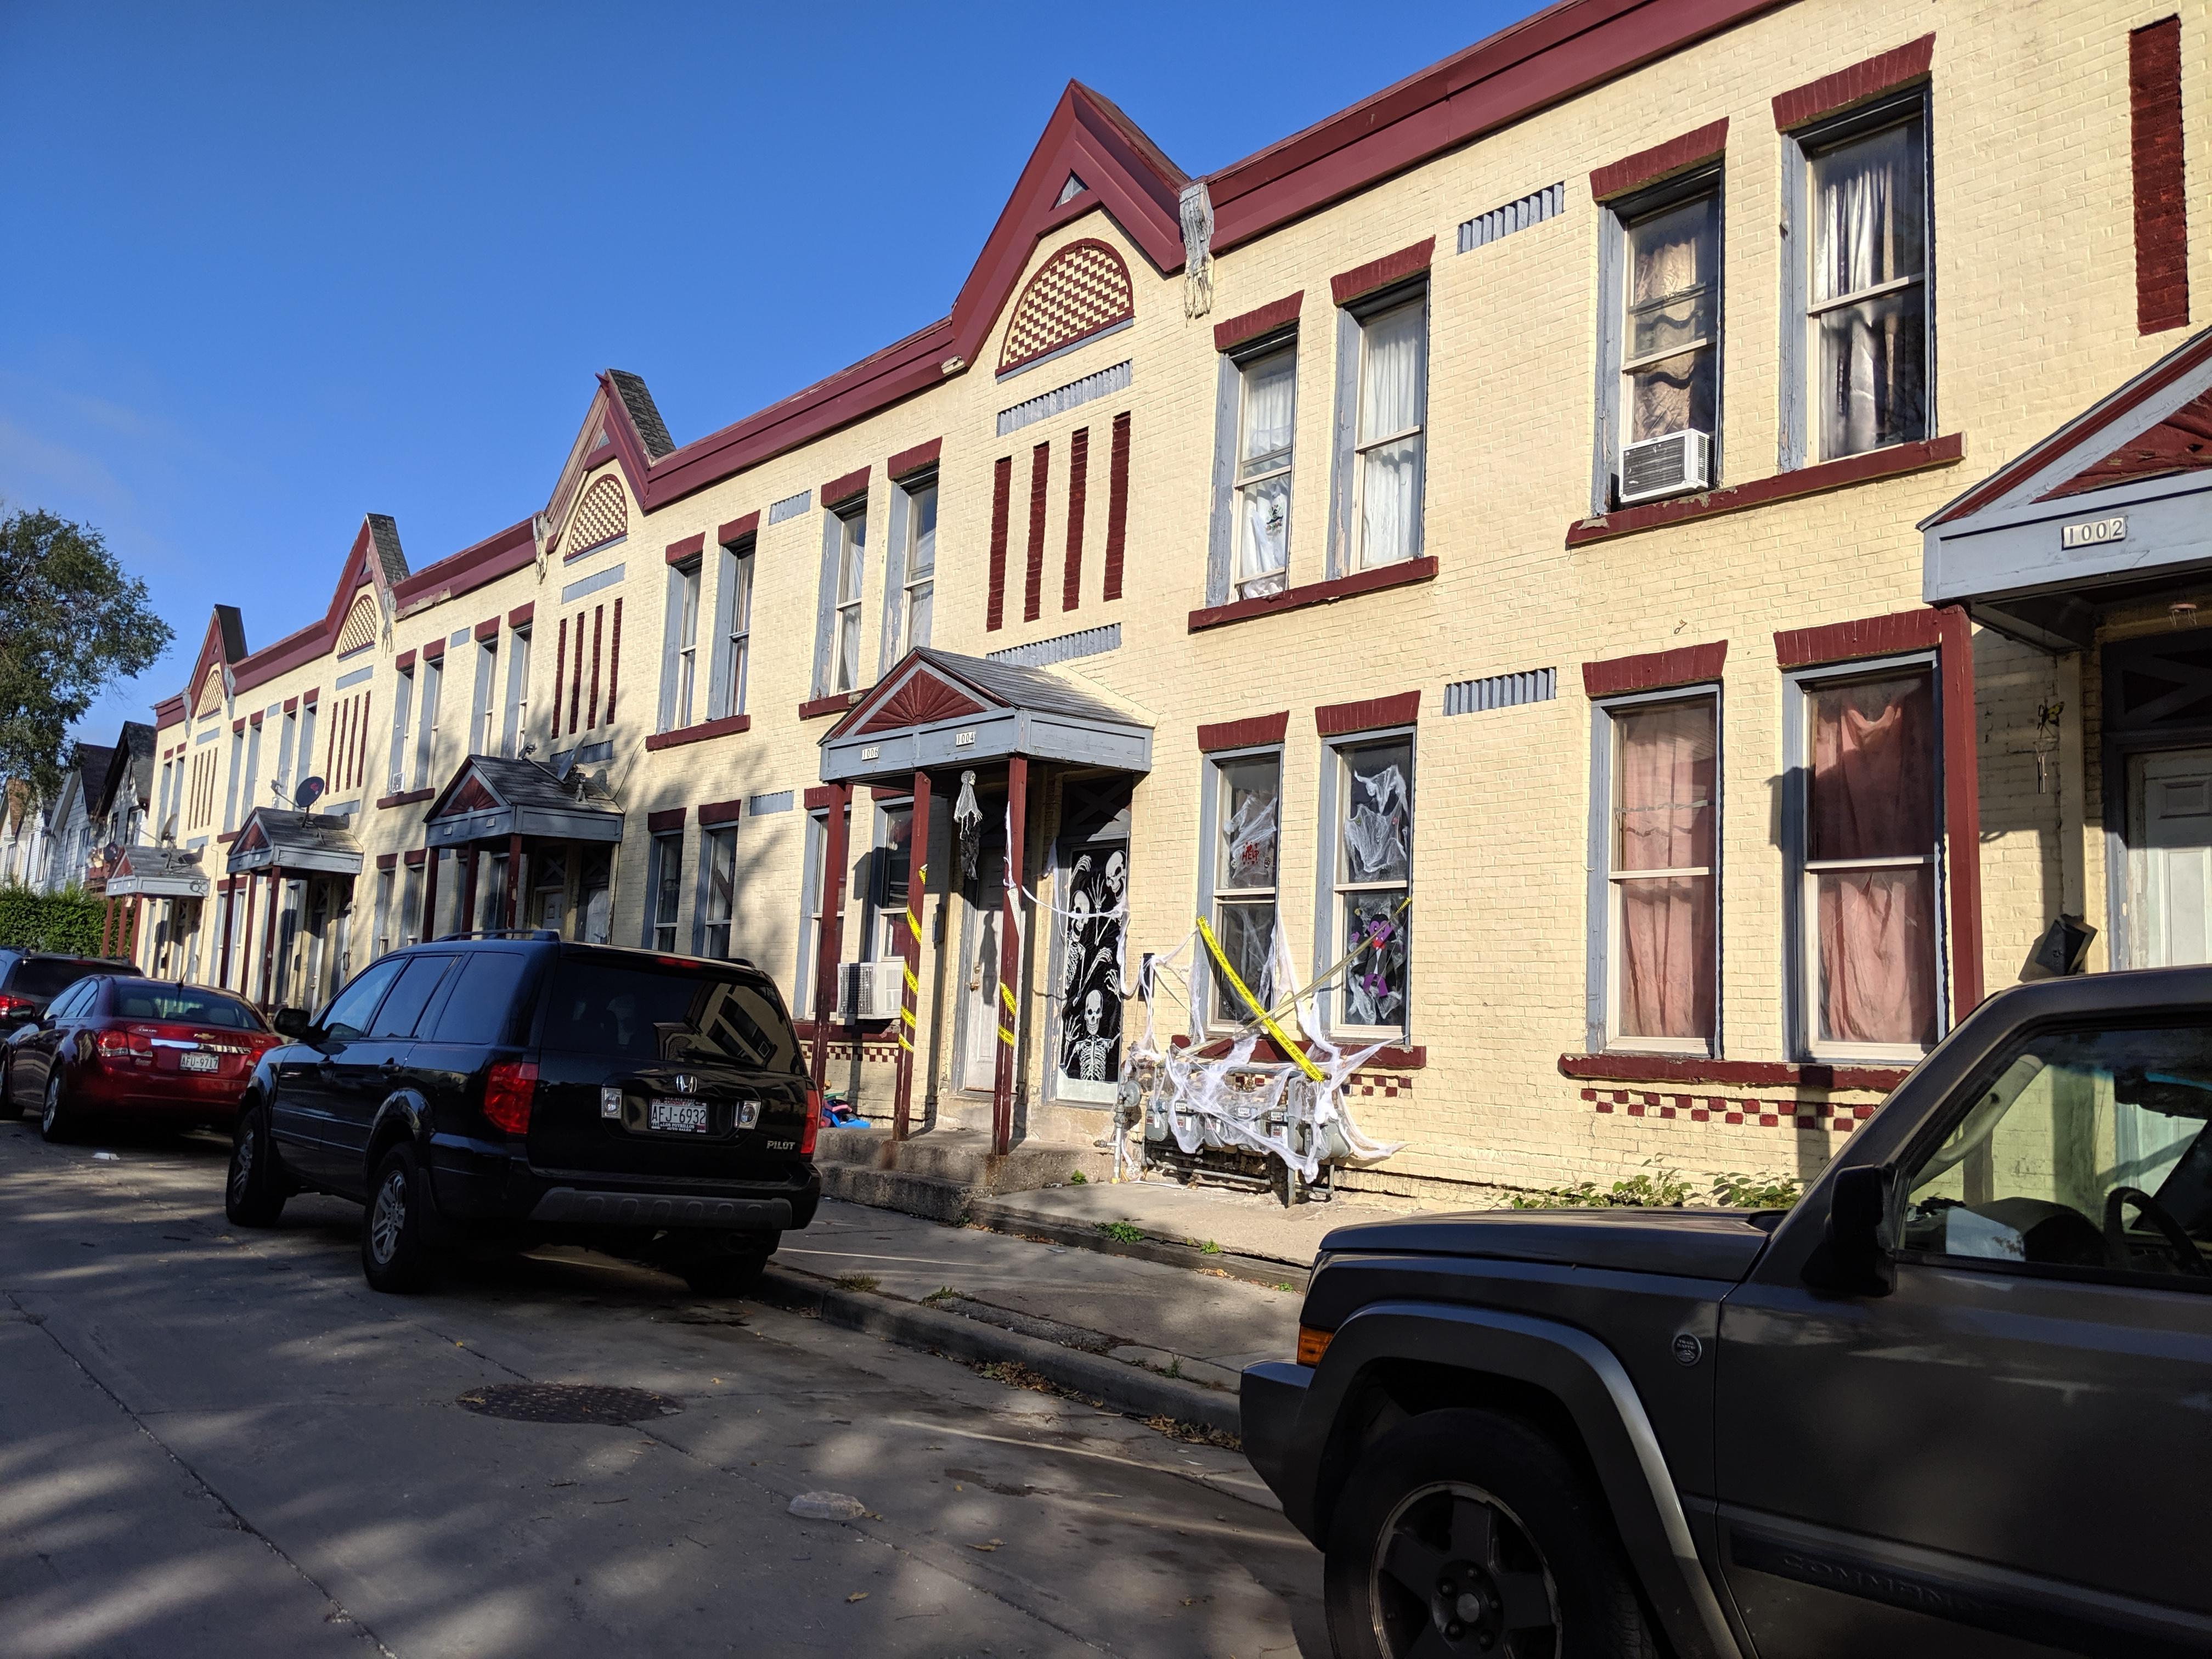 West Pierce Street residences. Photo by Carl Baehr.